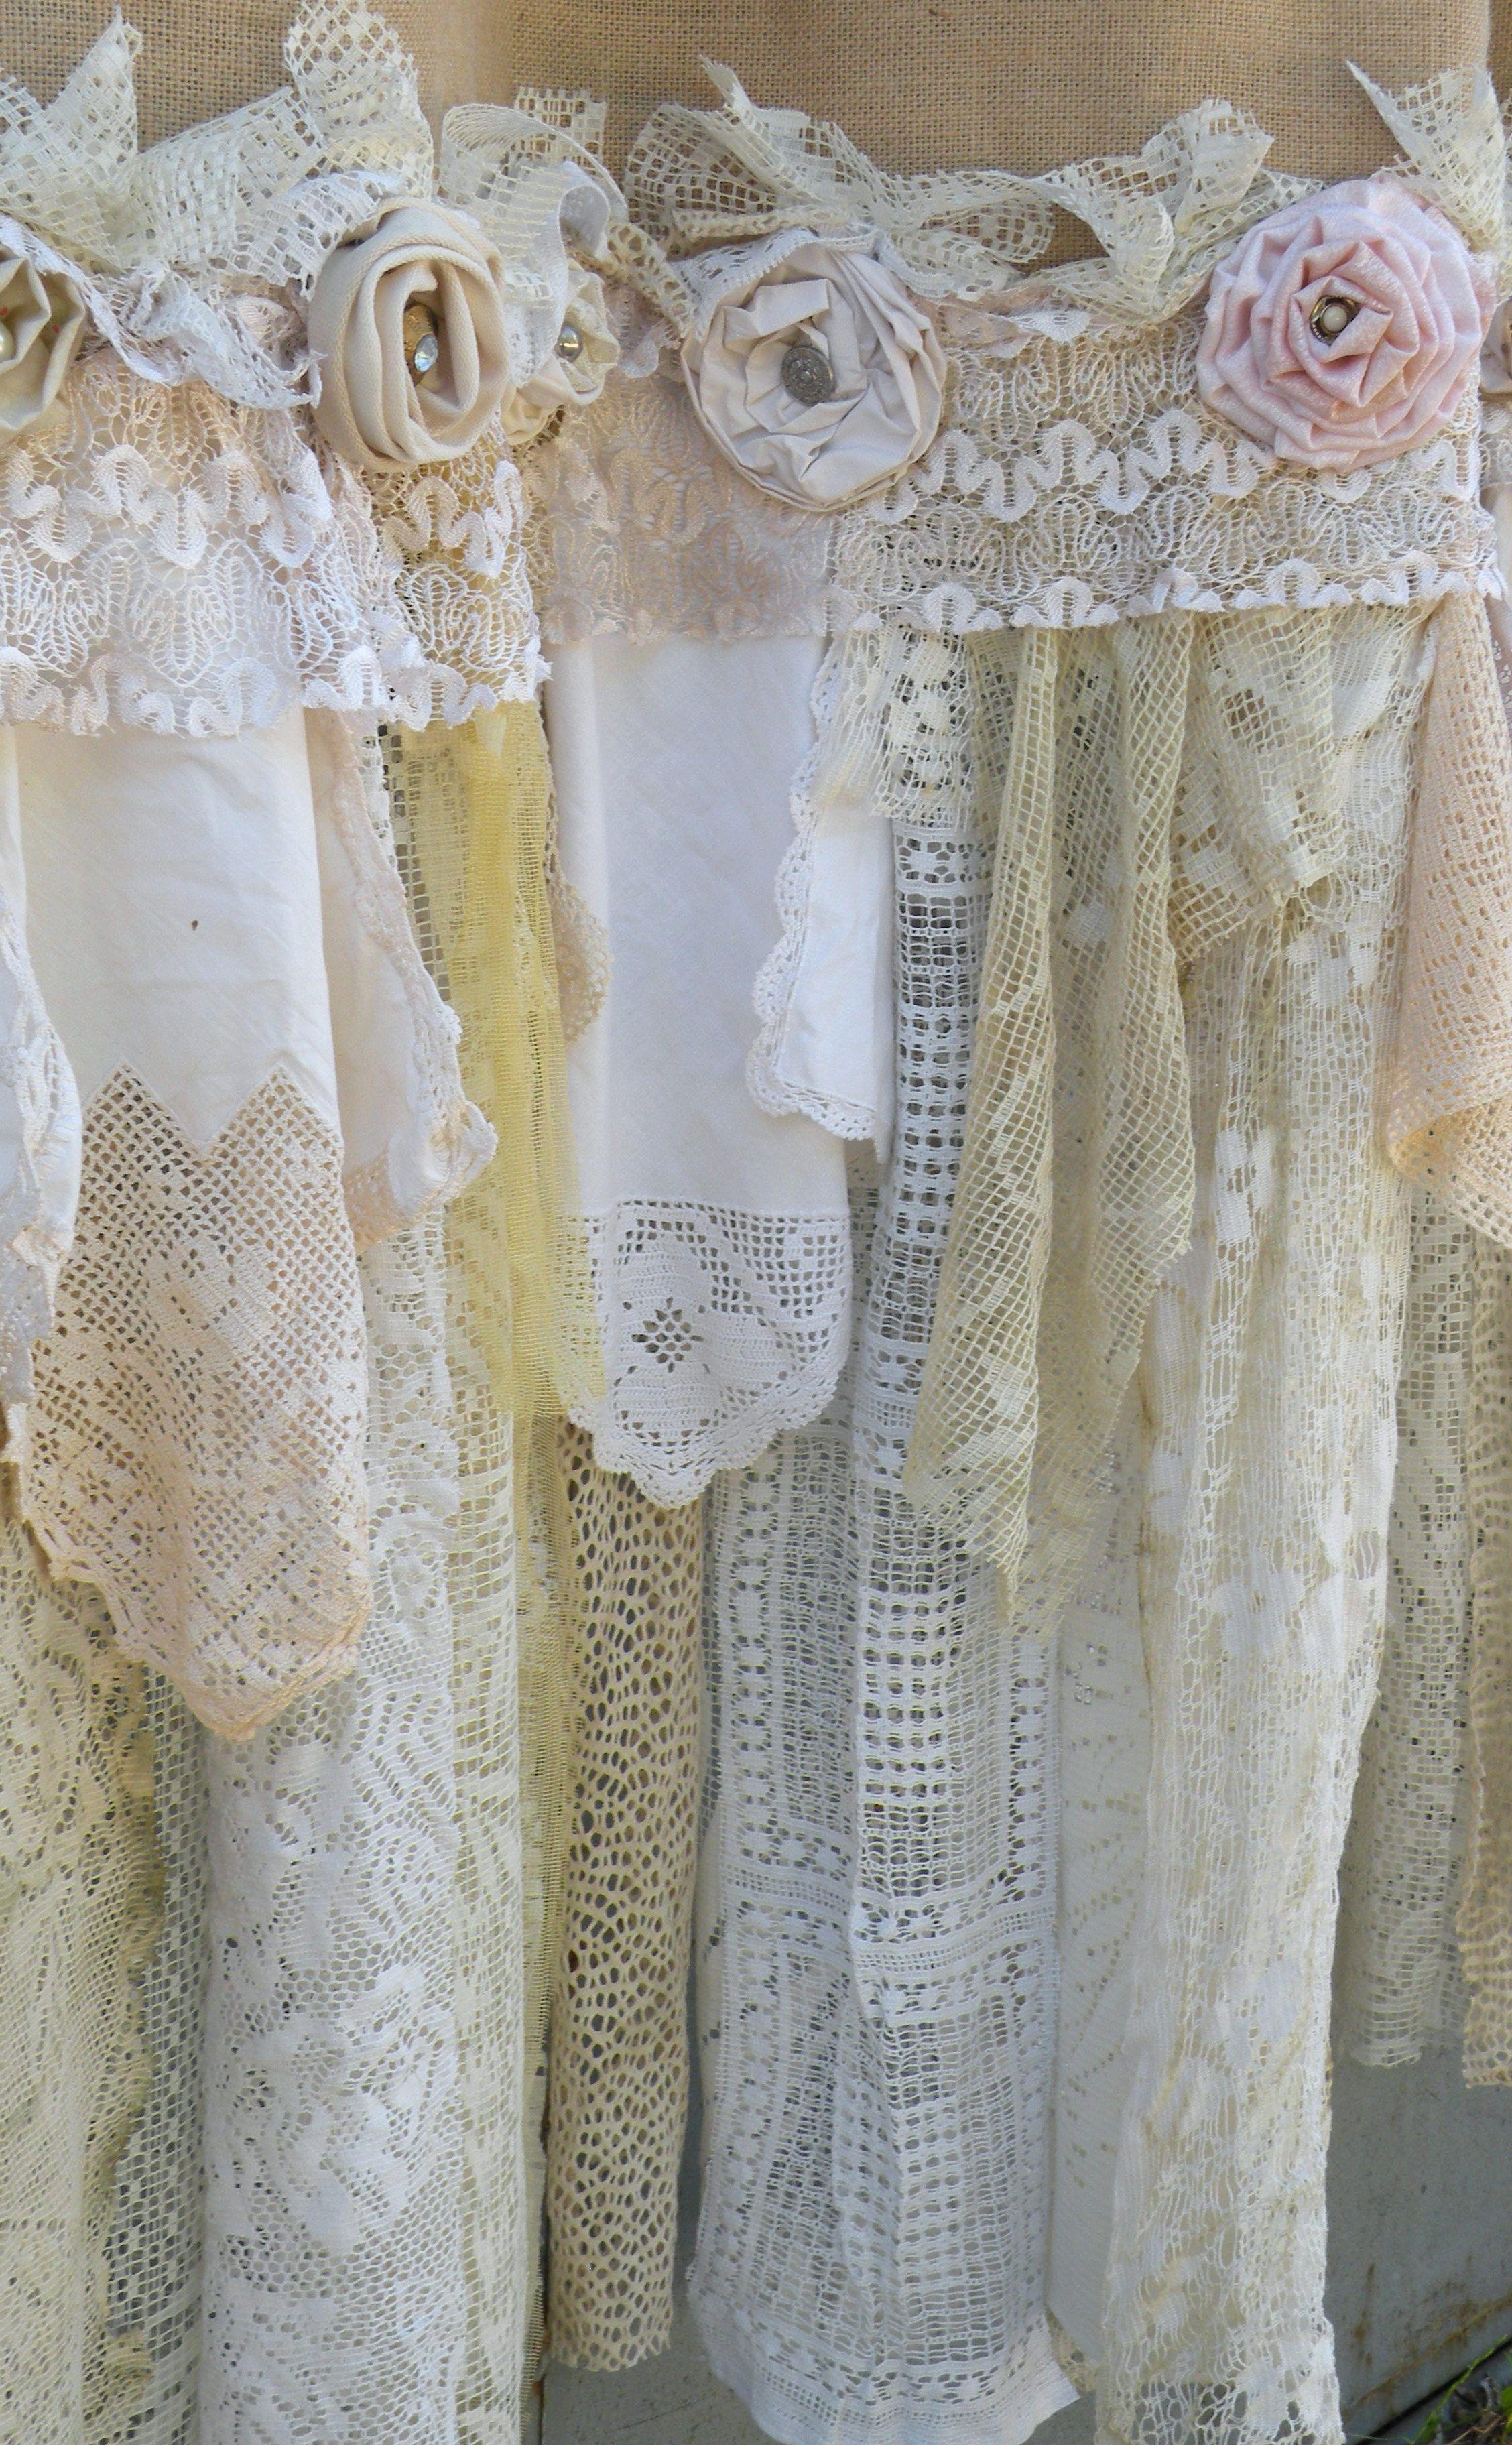 Burlap Vintage Lace Curtains Drapes Panel Boho Made To Order Etsy Vintage Lace Curtains Shabby Chic Curtains Rustic Shabby Chic Decor